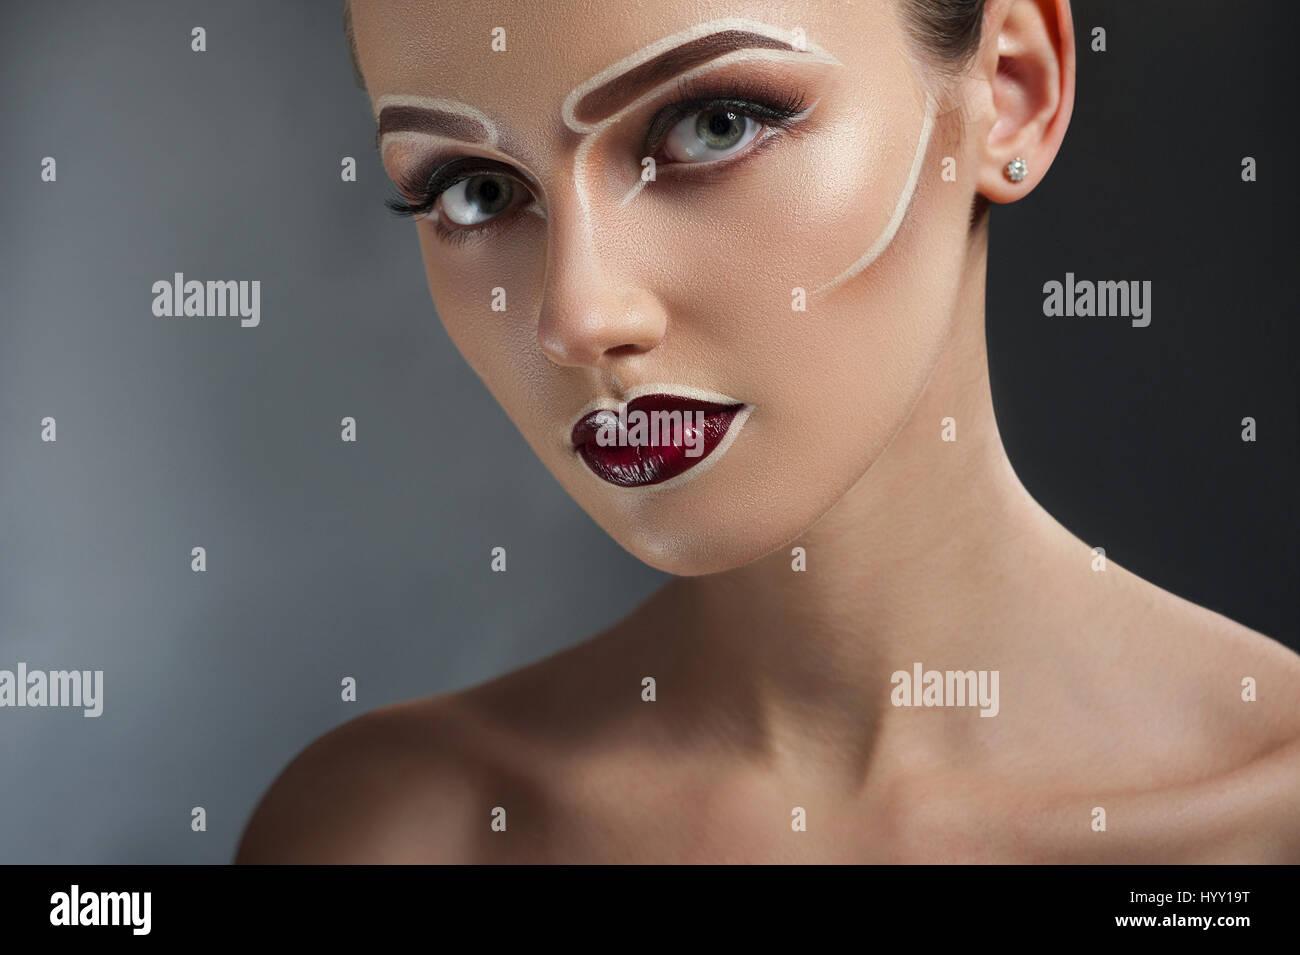 Hypnotizing depth. Closeup portrait of a gorgeous woman wearing artistic pop art makeup in brown tones - Stock Image